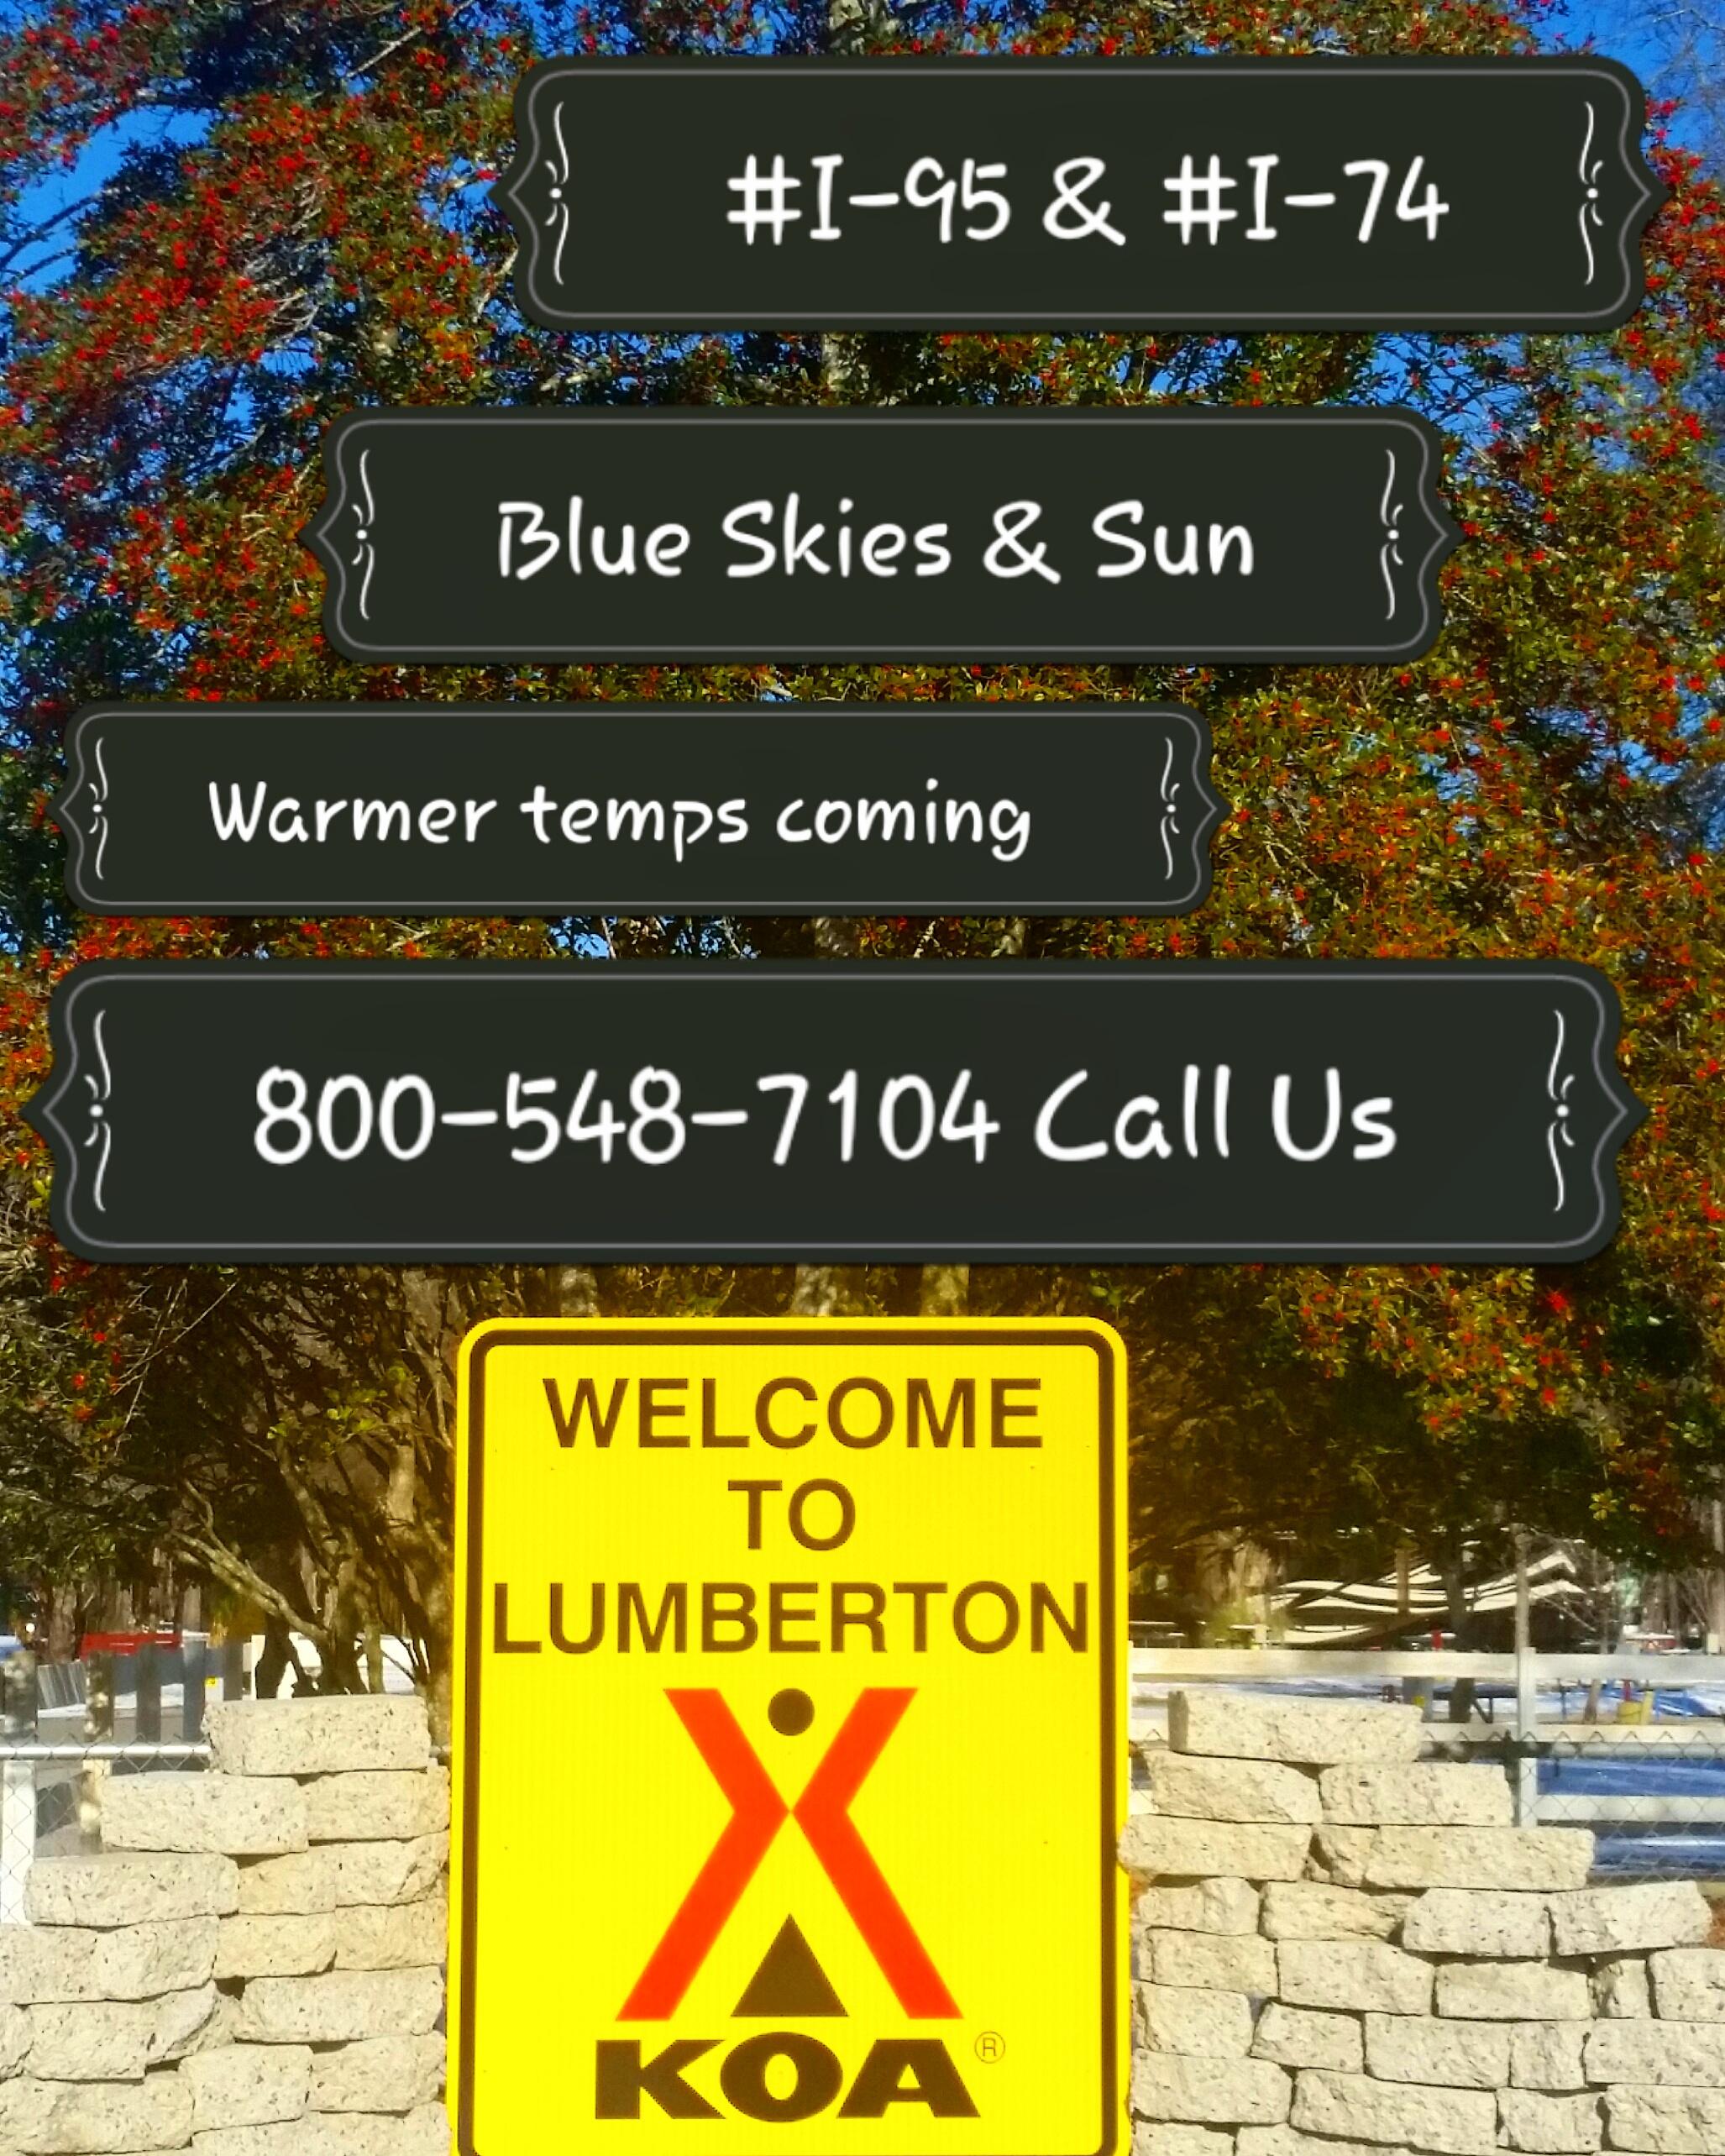 Lumberton / I-95 KOA Journey image 15